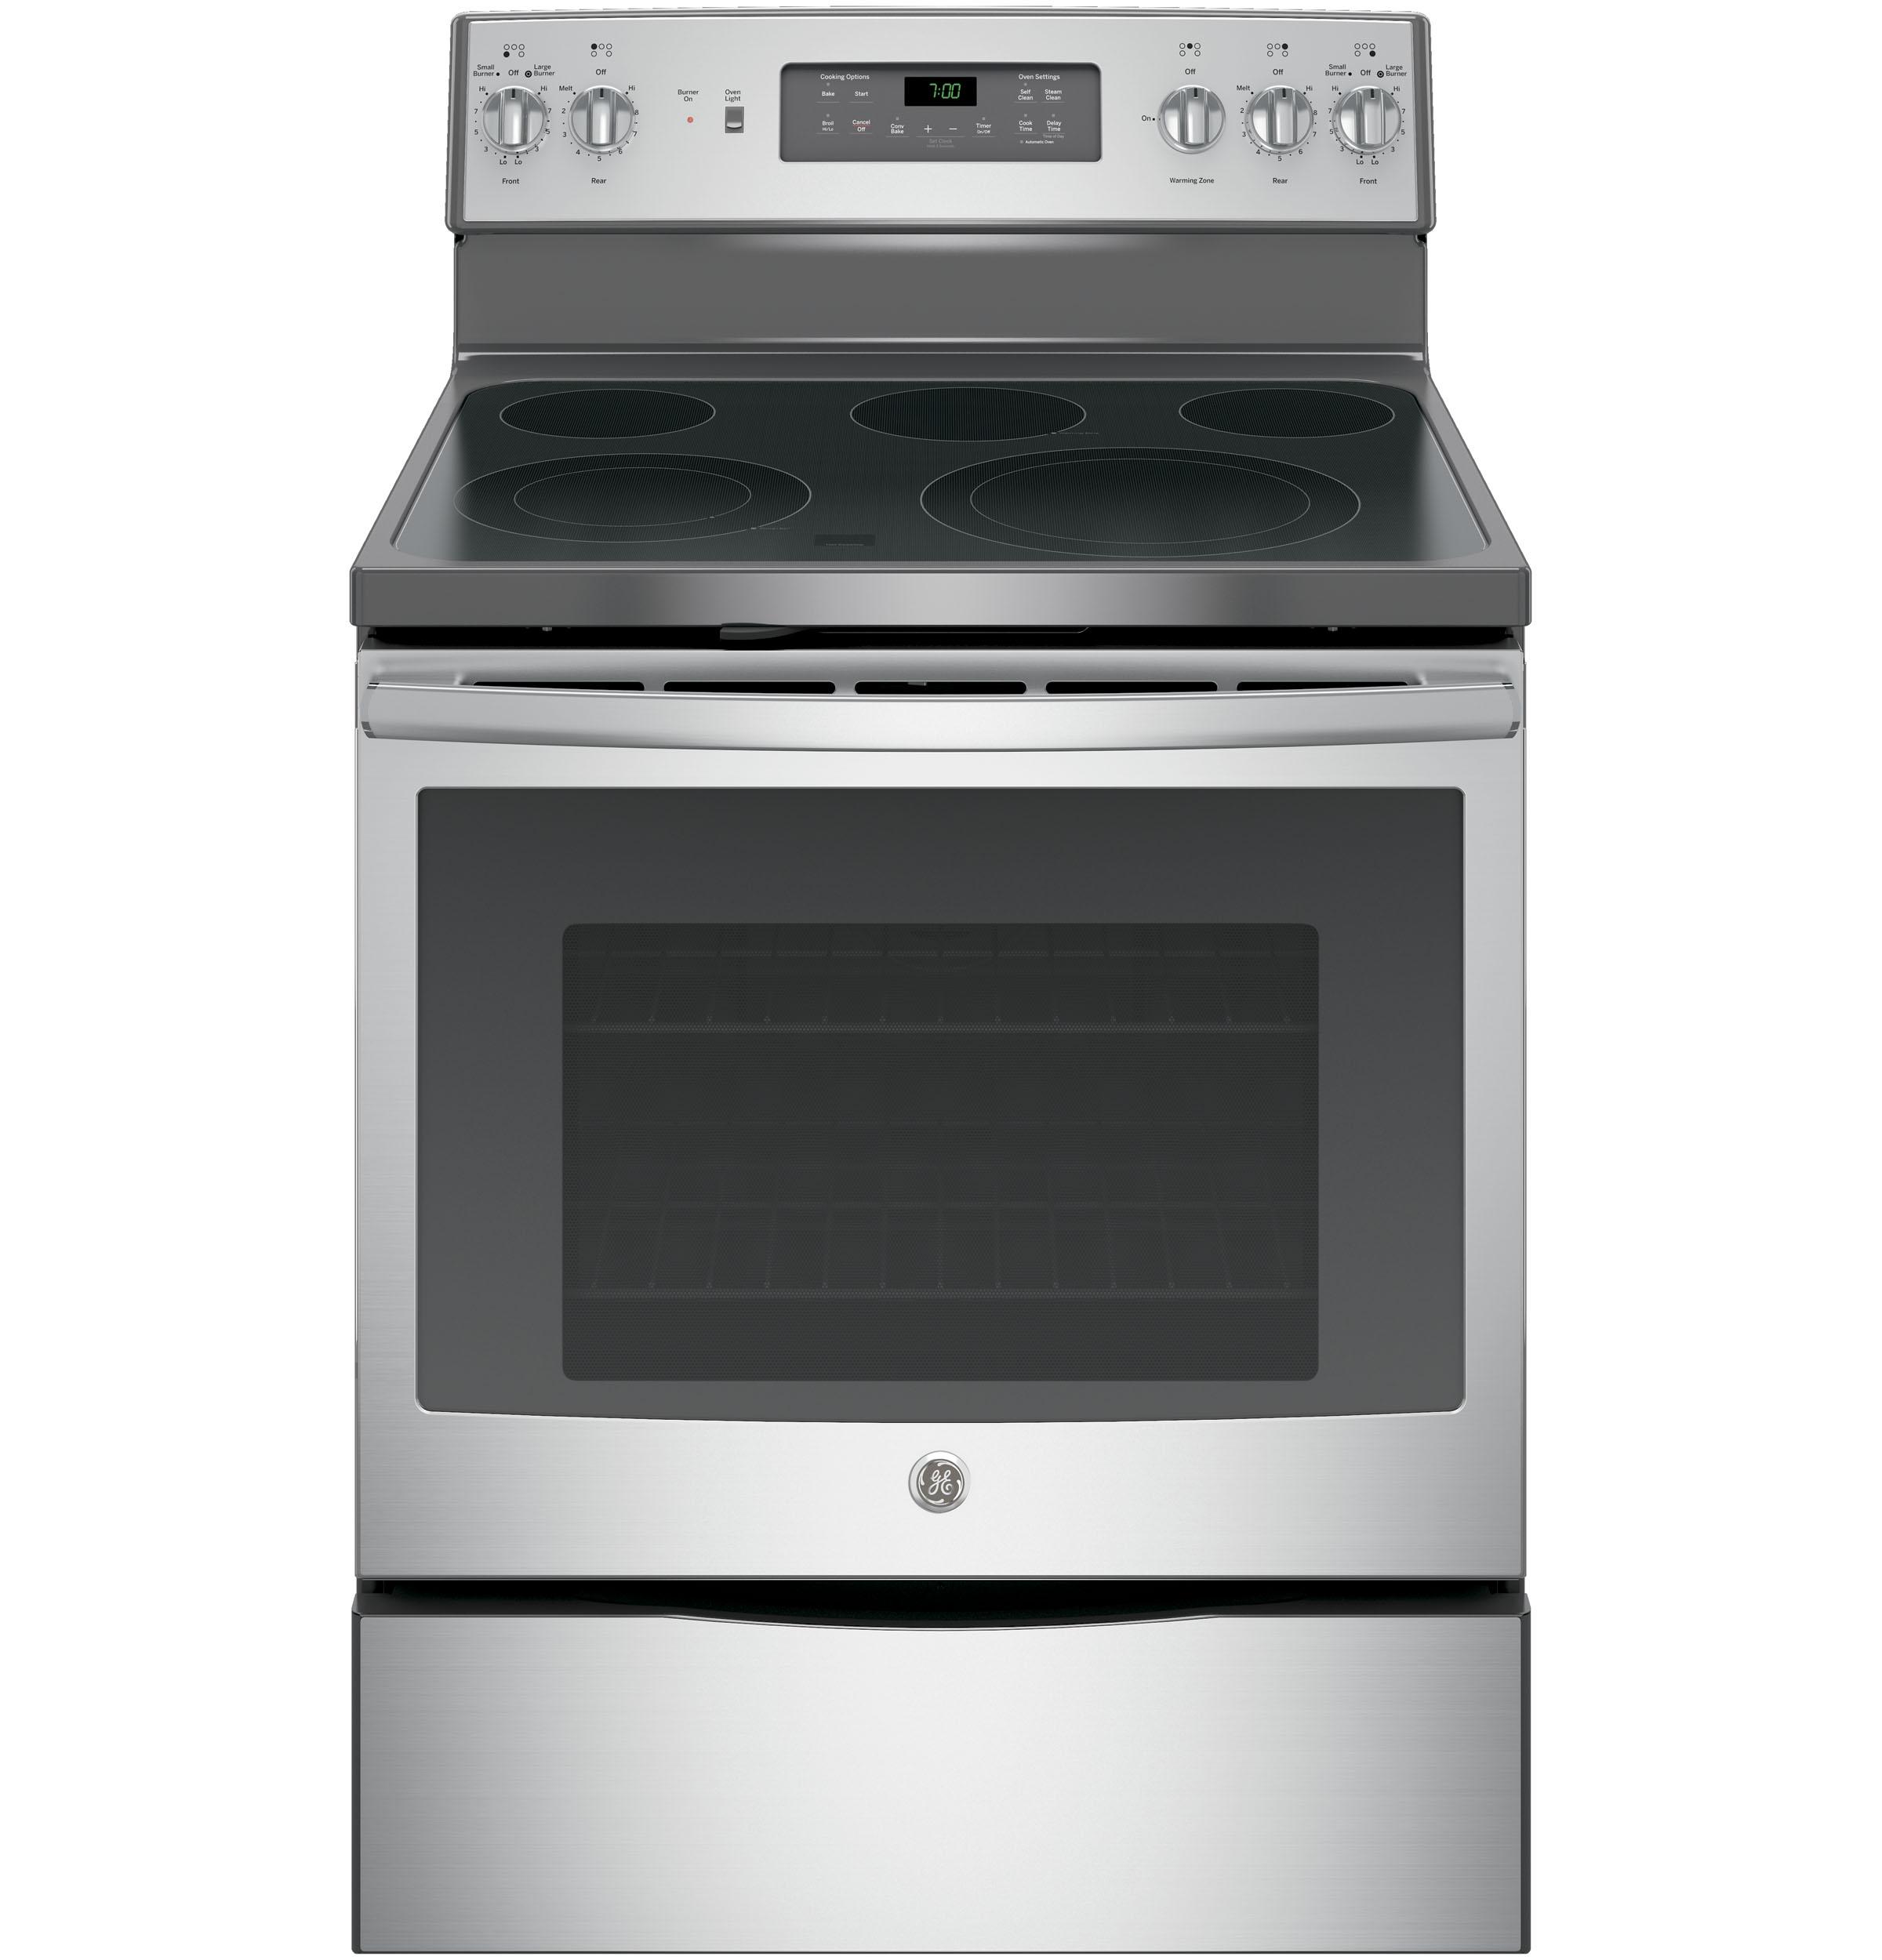 "GE Appliances GE Electric Ranges 30"" Electric Convection Range - Item Number: JB700SJSS"